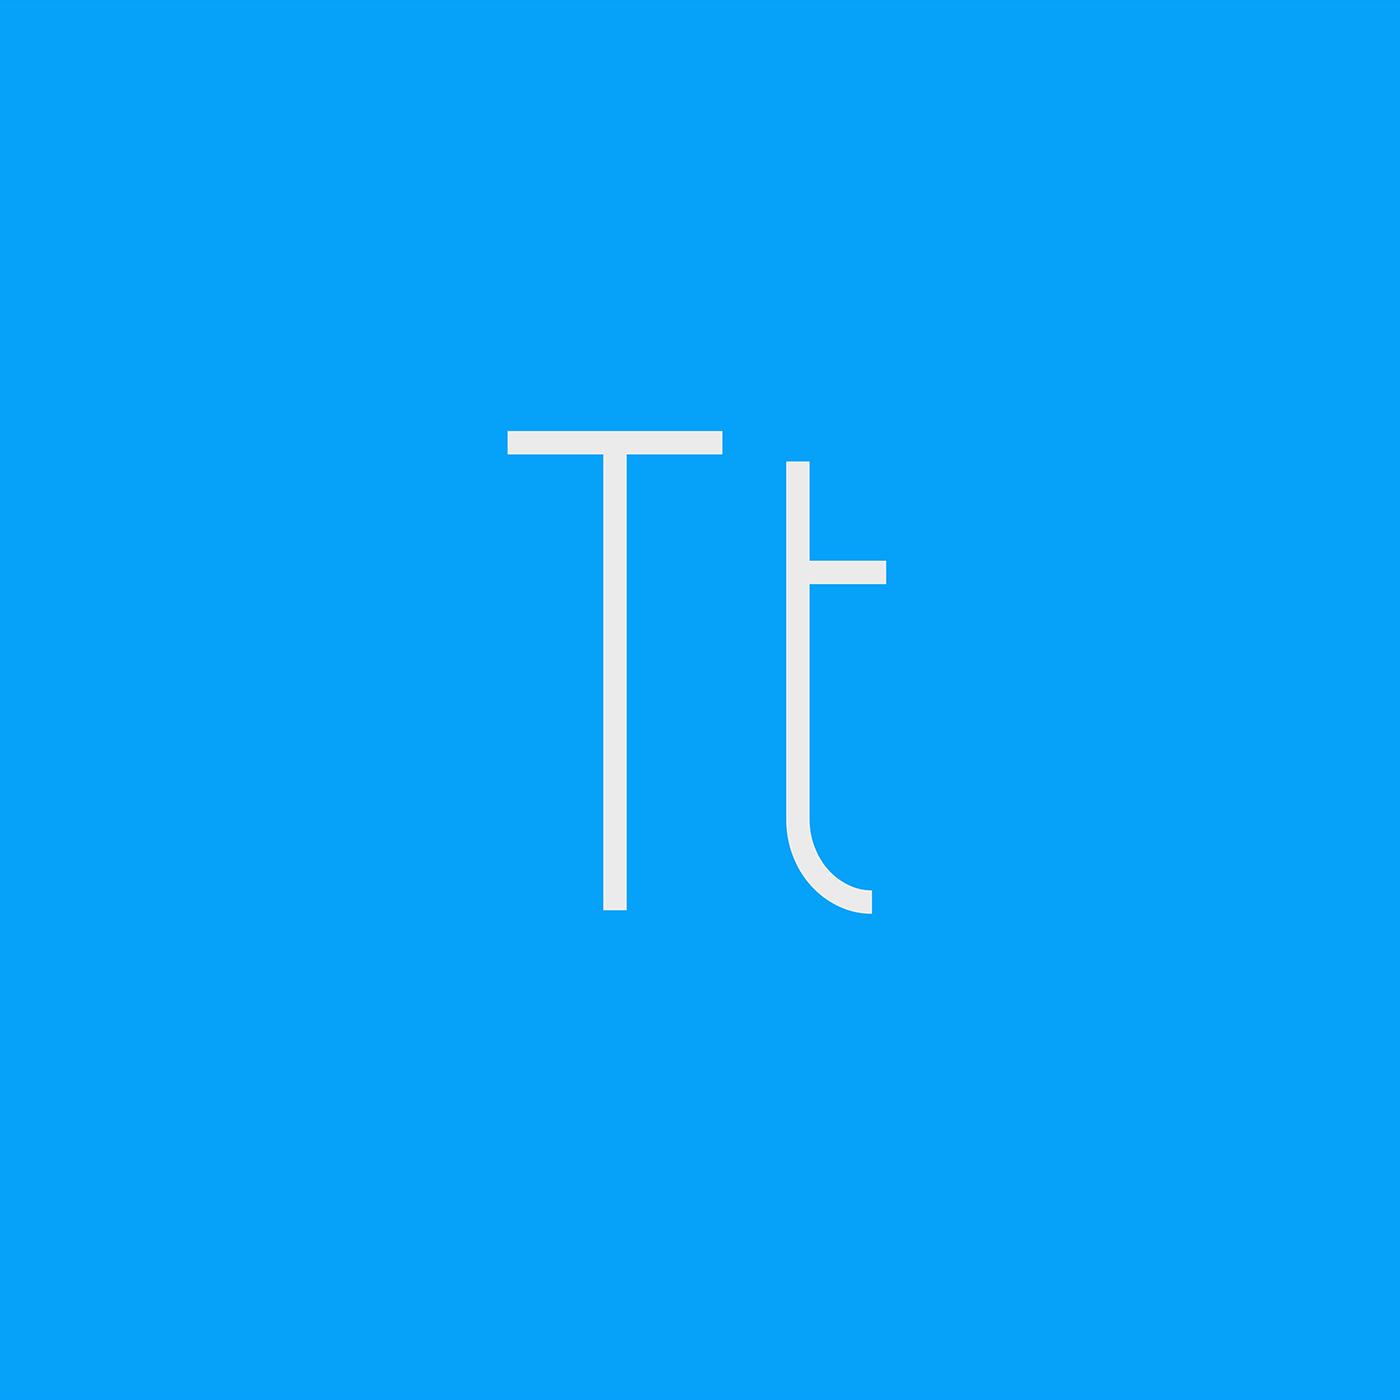 Simplifica,free,freebie,type,font,Typeface,typo,elegant,smooth,fresh,new